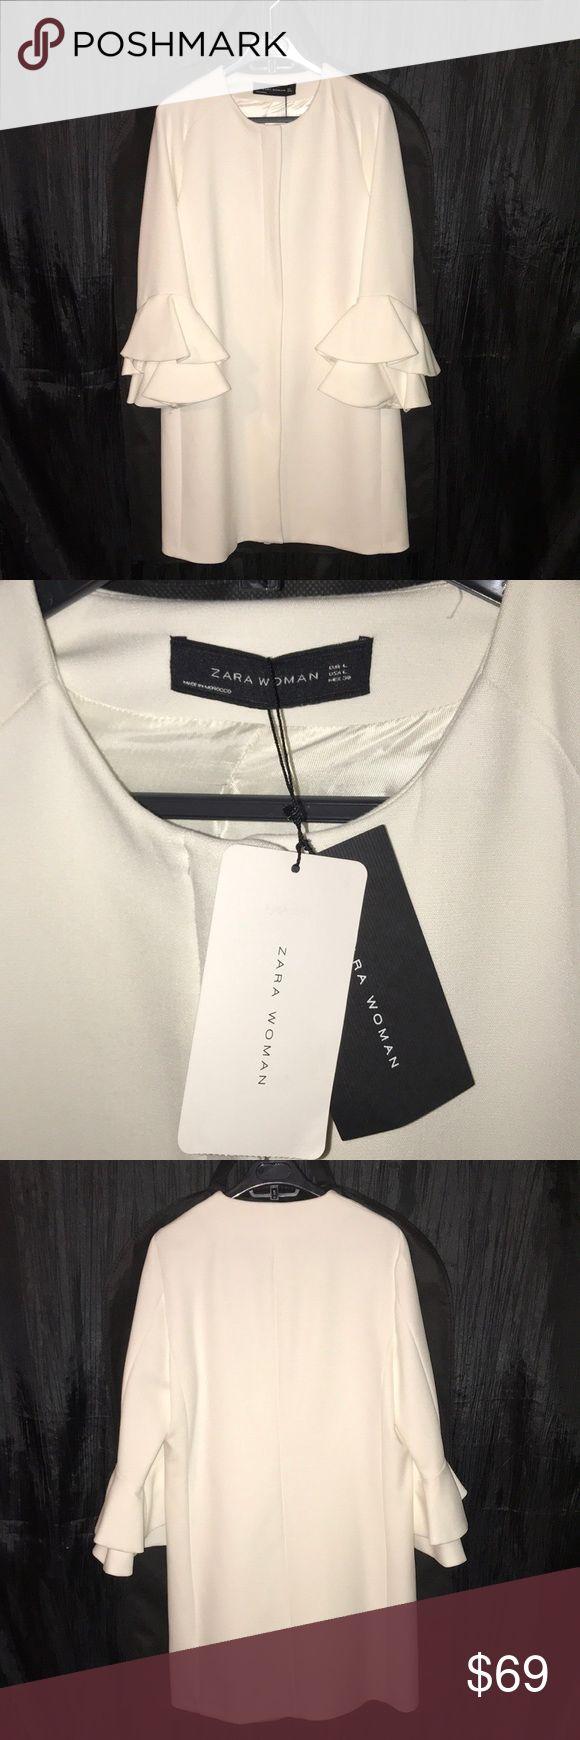 NWT ZARA Double Ruffle Bell Sleeve Coat NWT ZARA Double Ruffle Bell Sleeve Coat... Great Top Coat ... Wear it formal or casual!!! Includes Coat Bag Zara Jackets & Coats